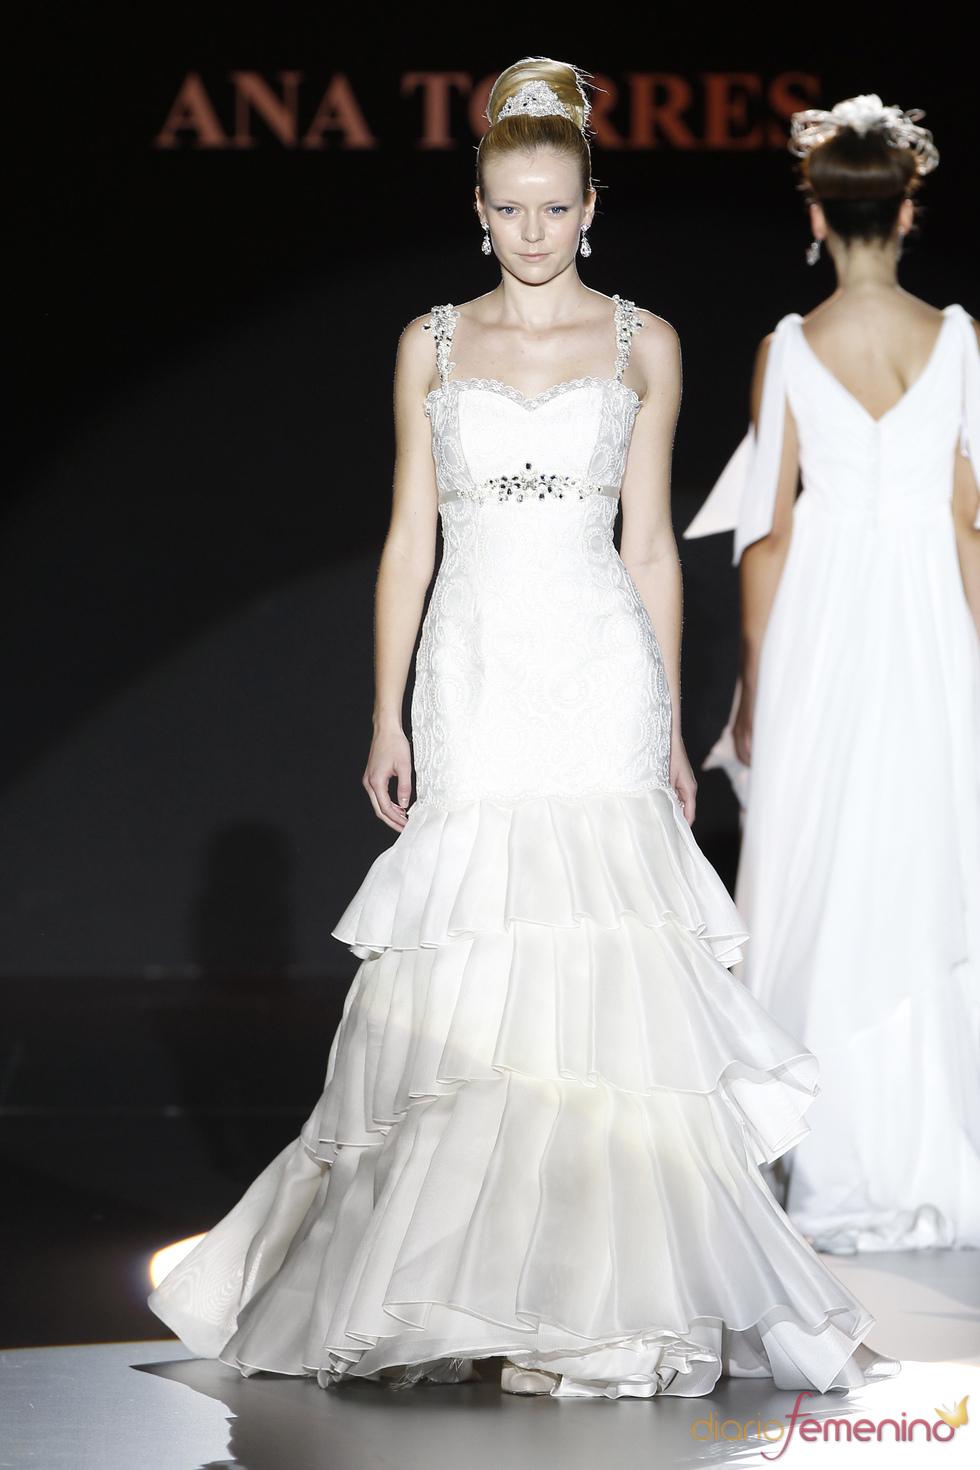 Vestido estilo sevillana de Ana Torres